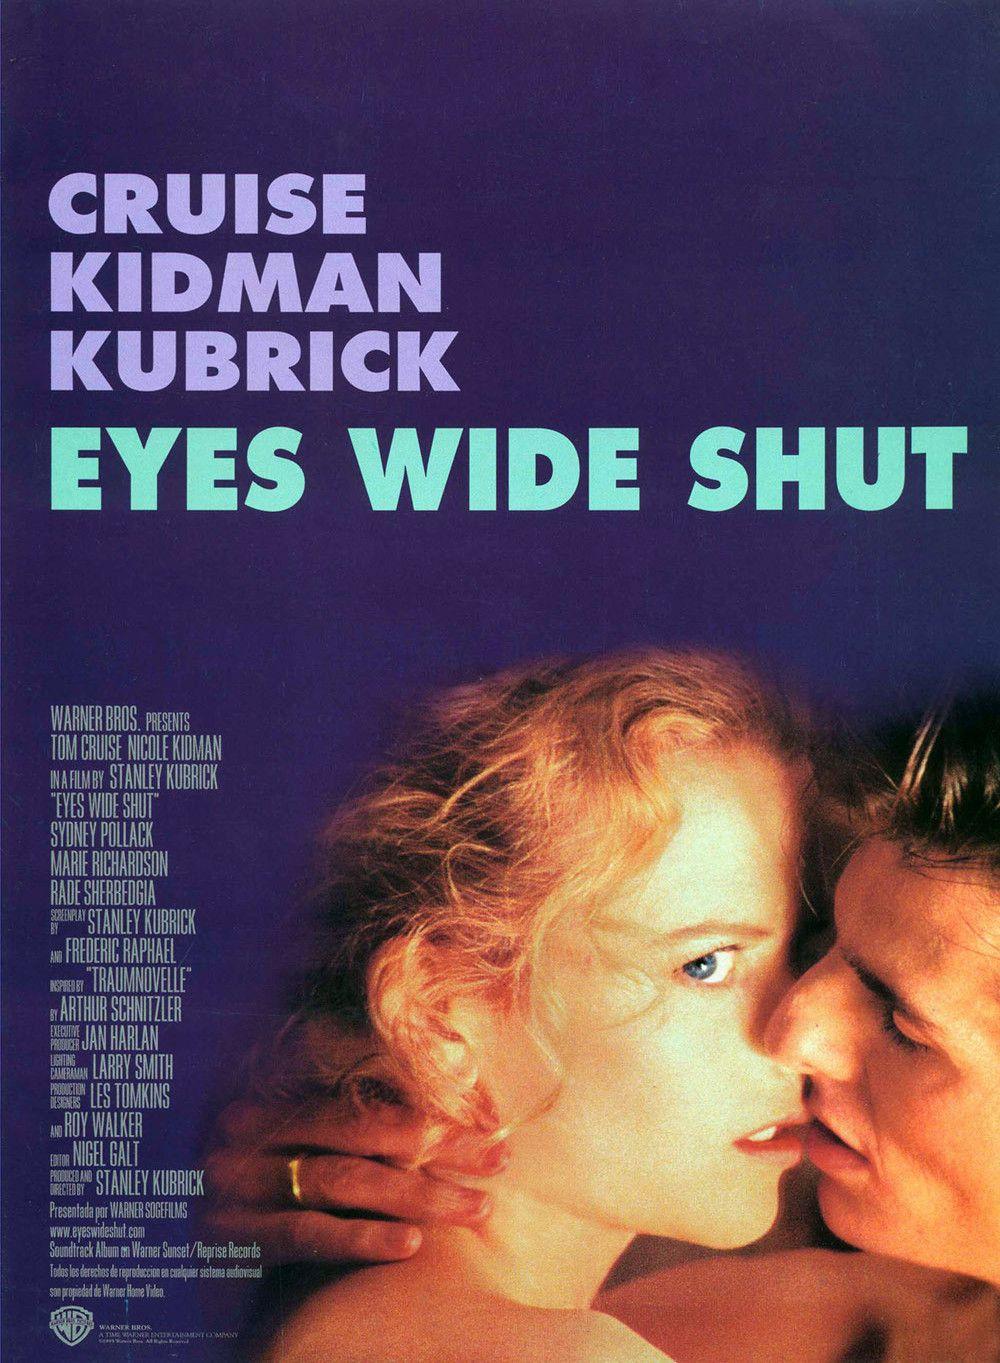 Eyes wide shut (1999) de Stanley Kubrick